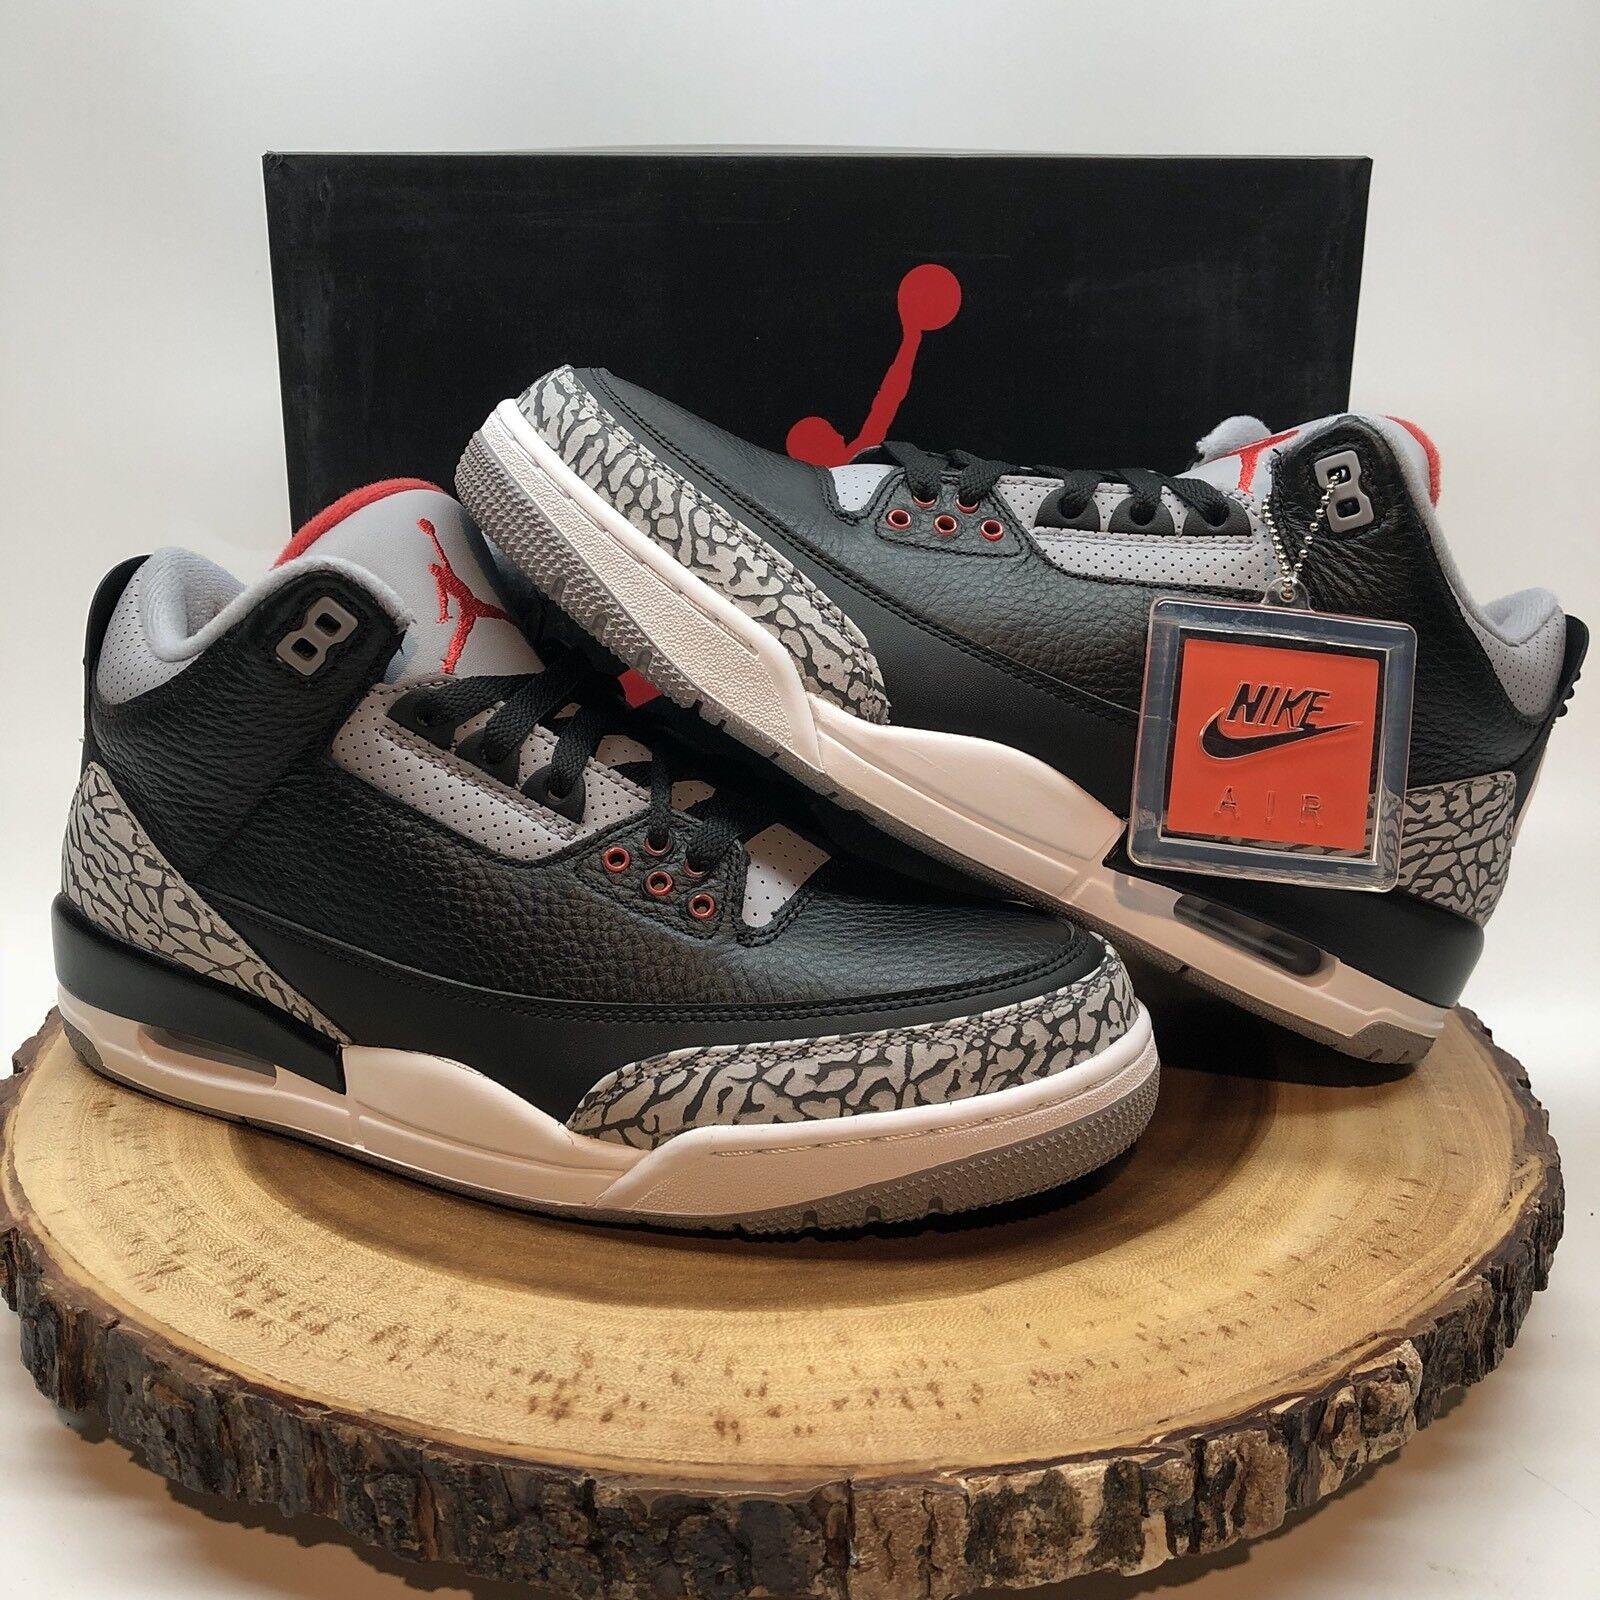 2018 Nike Air Jordan Retro 3 OG BC3 Black Cement 854262 001 Sz 10 White XI IV